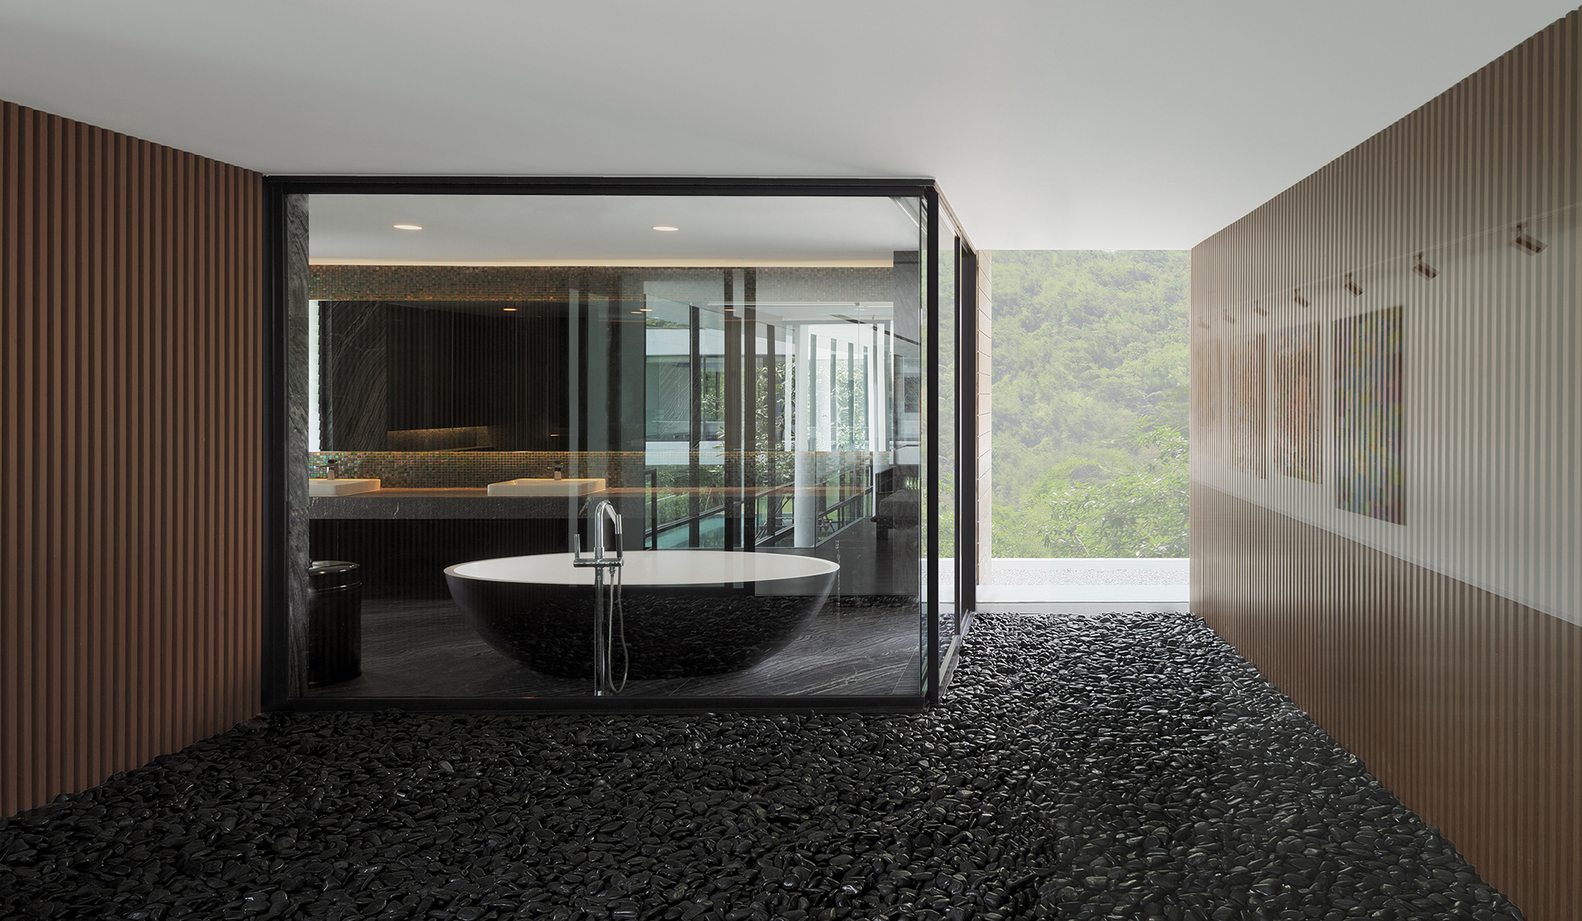 ¿Cuáles son los mejores revestimientos para baños?,© Soopakorn Srisakul and Ayutt Mahasom. Image Horizontal House / Ayutt and Associates Design